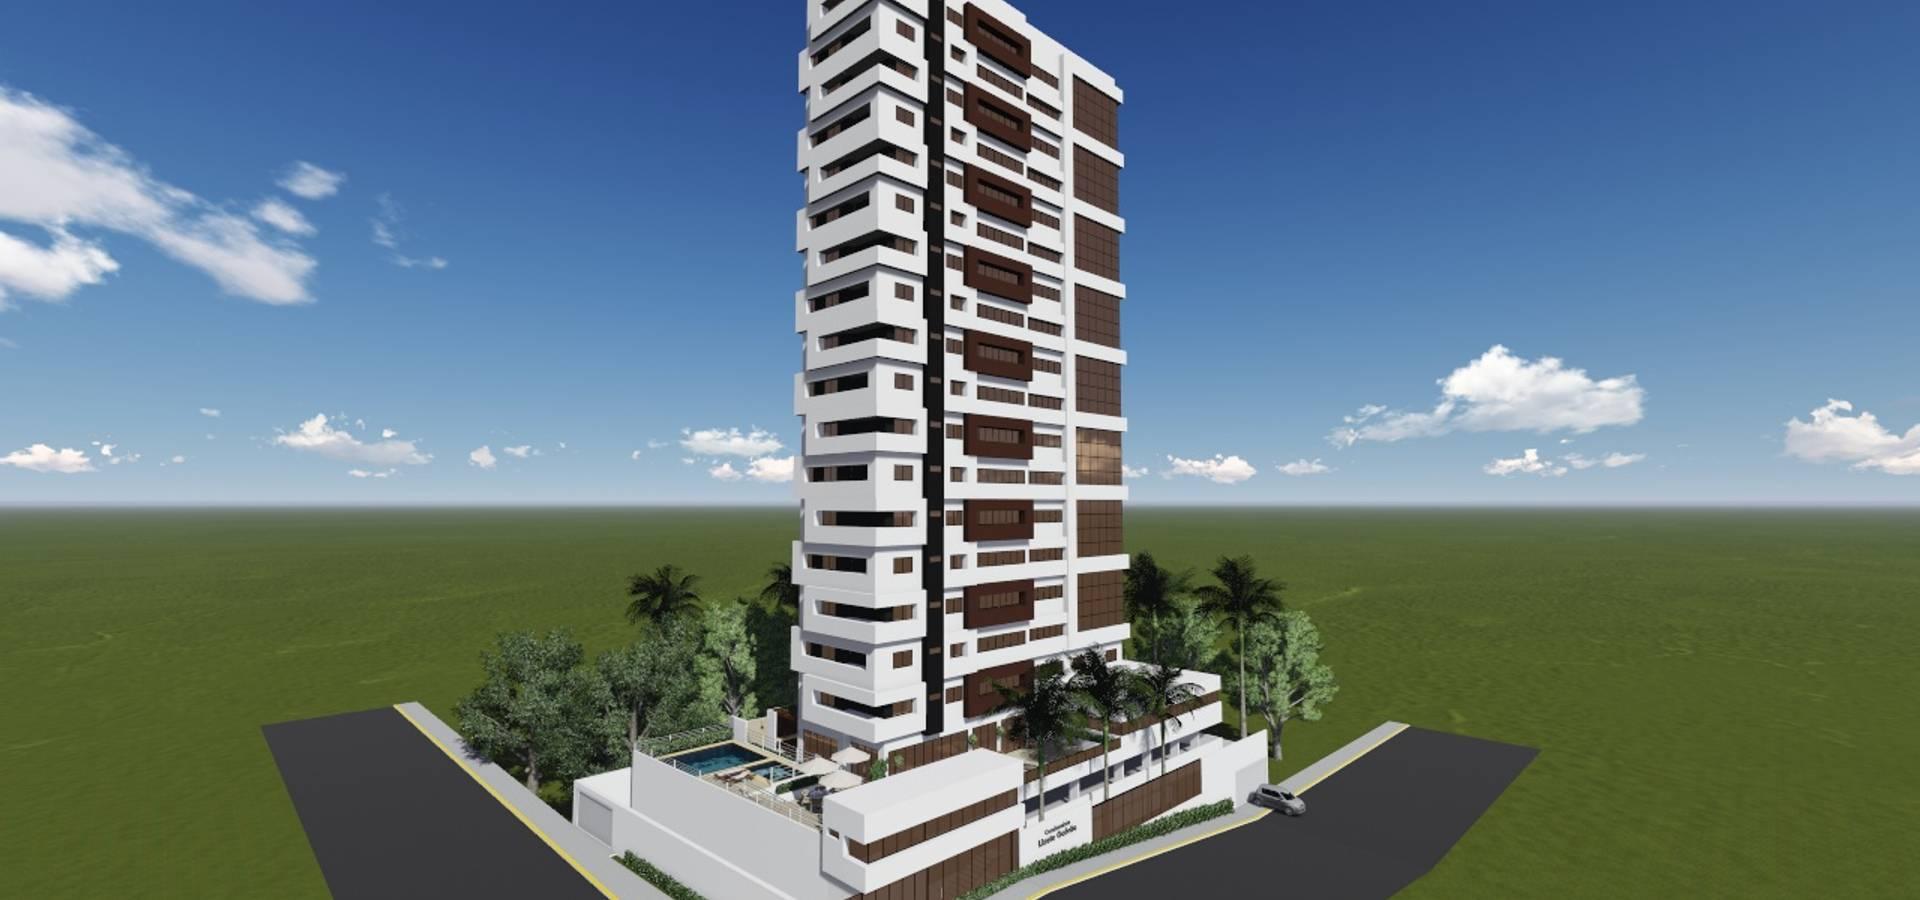 Queiroz Leite Arquitetura Ltda.